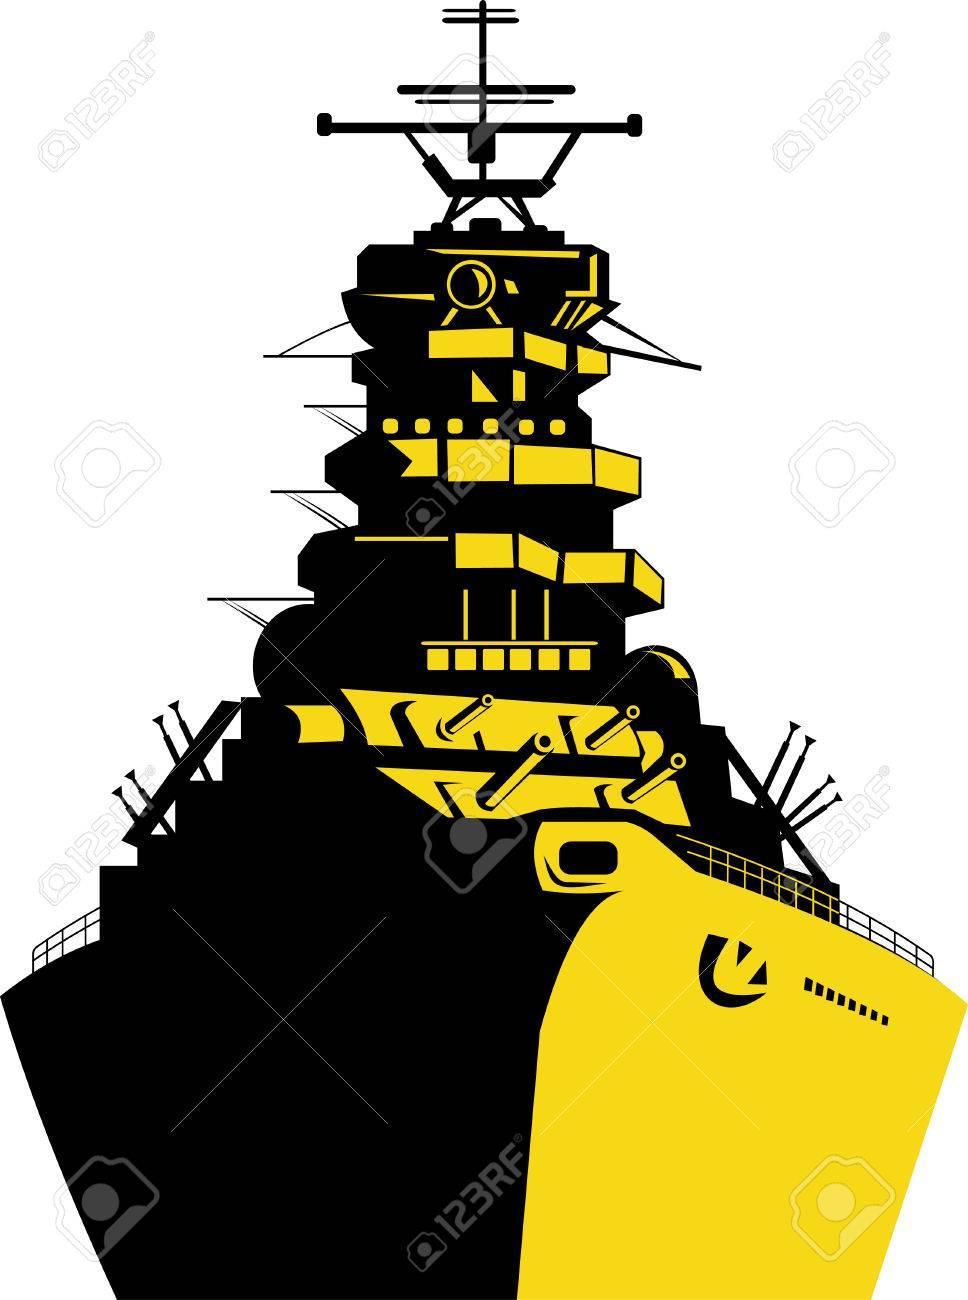 warship with big guns royalty free cliparts vectors and stock rh 123rf com battleship clip art free navy battleship clipart